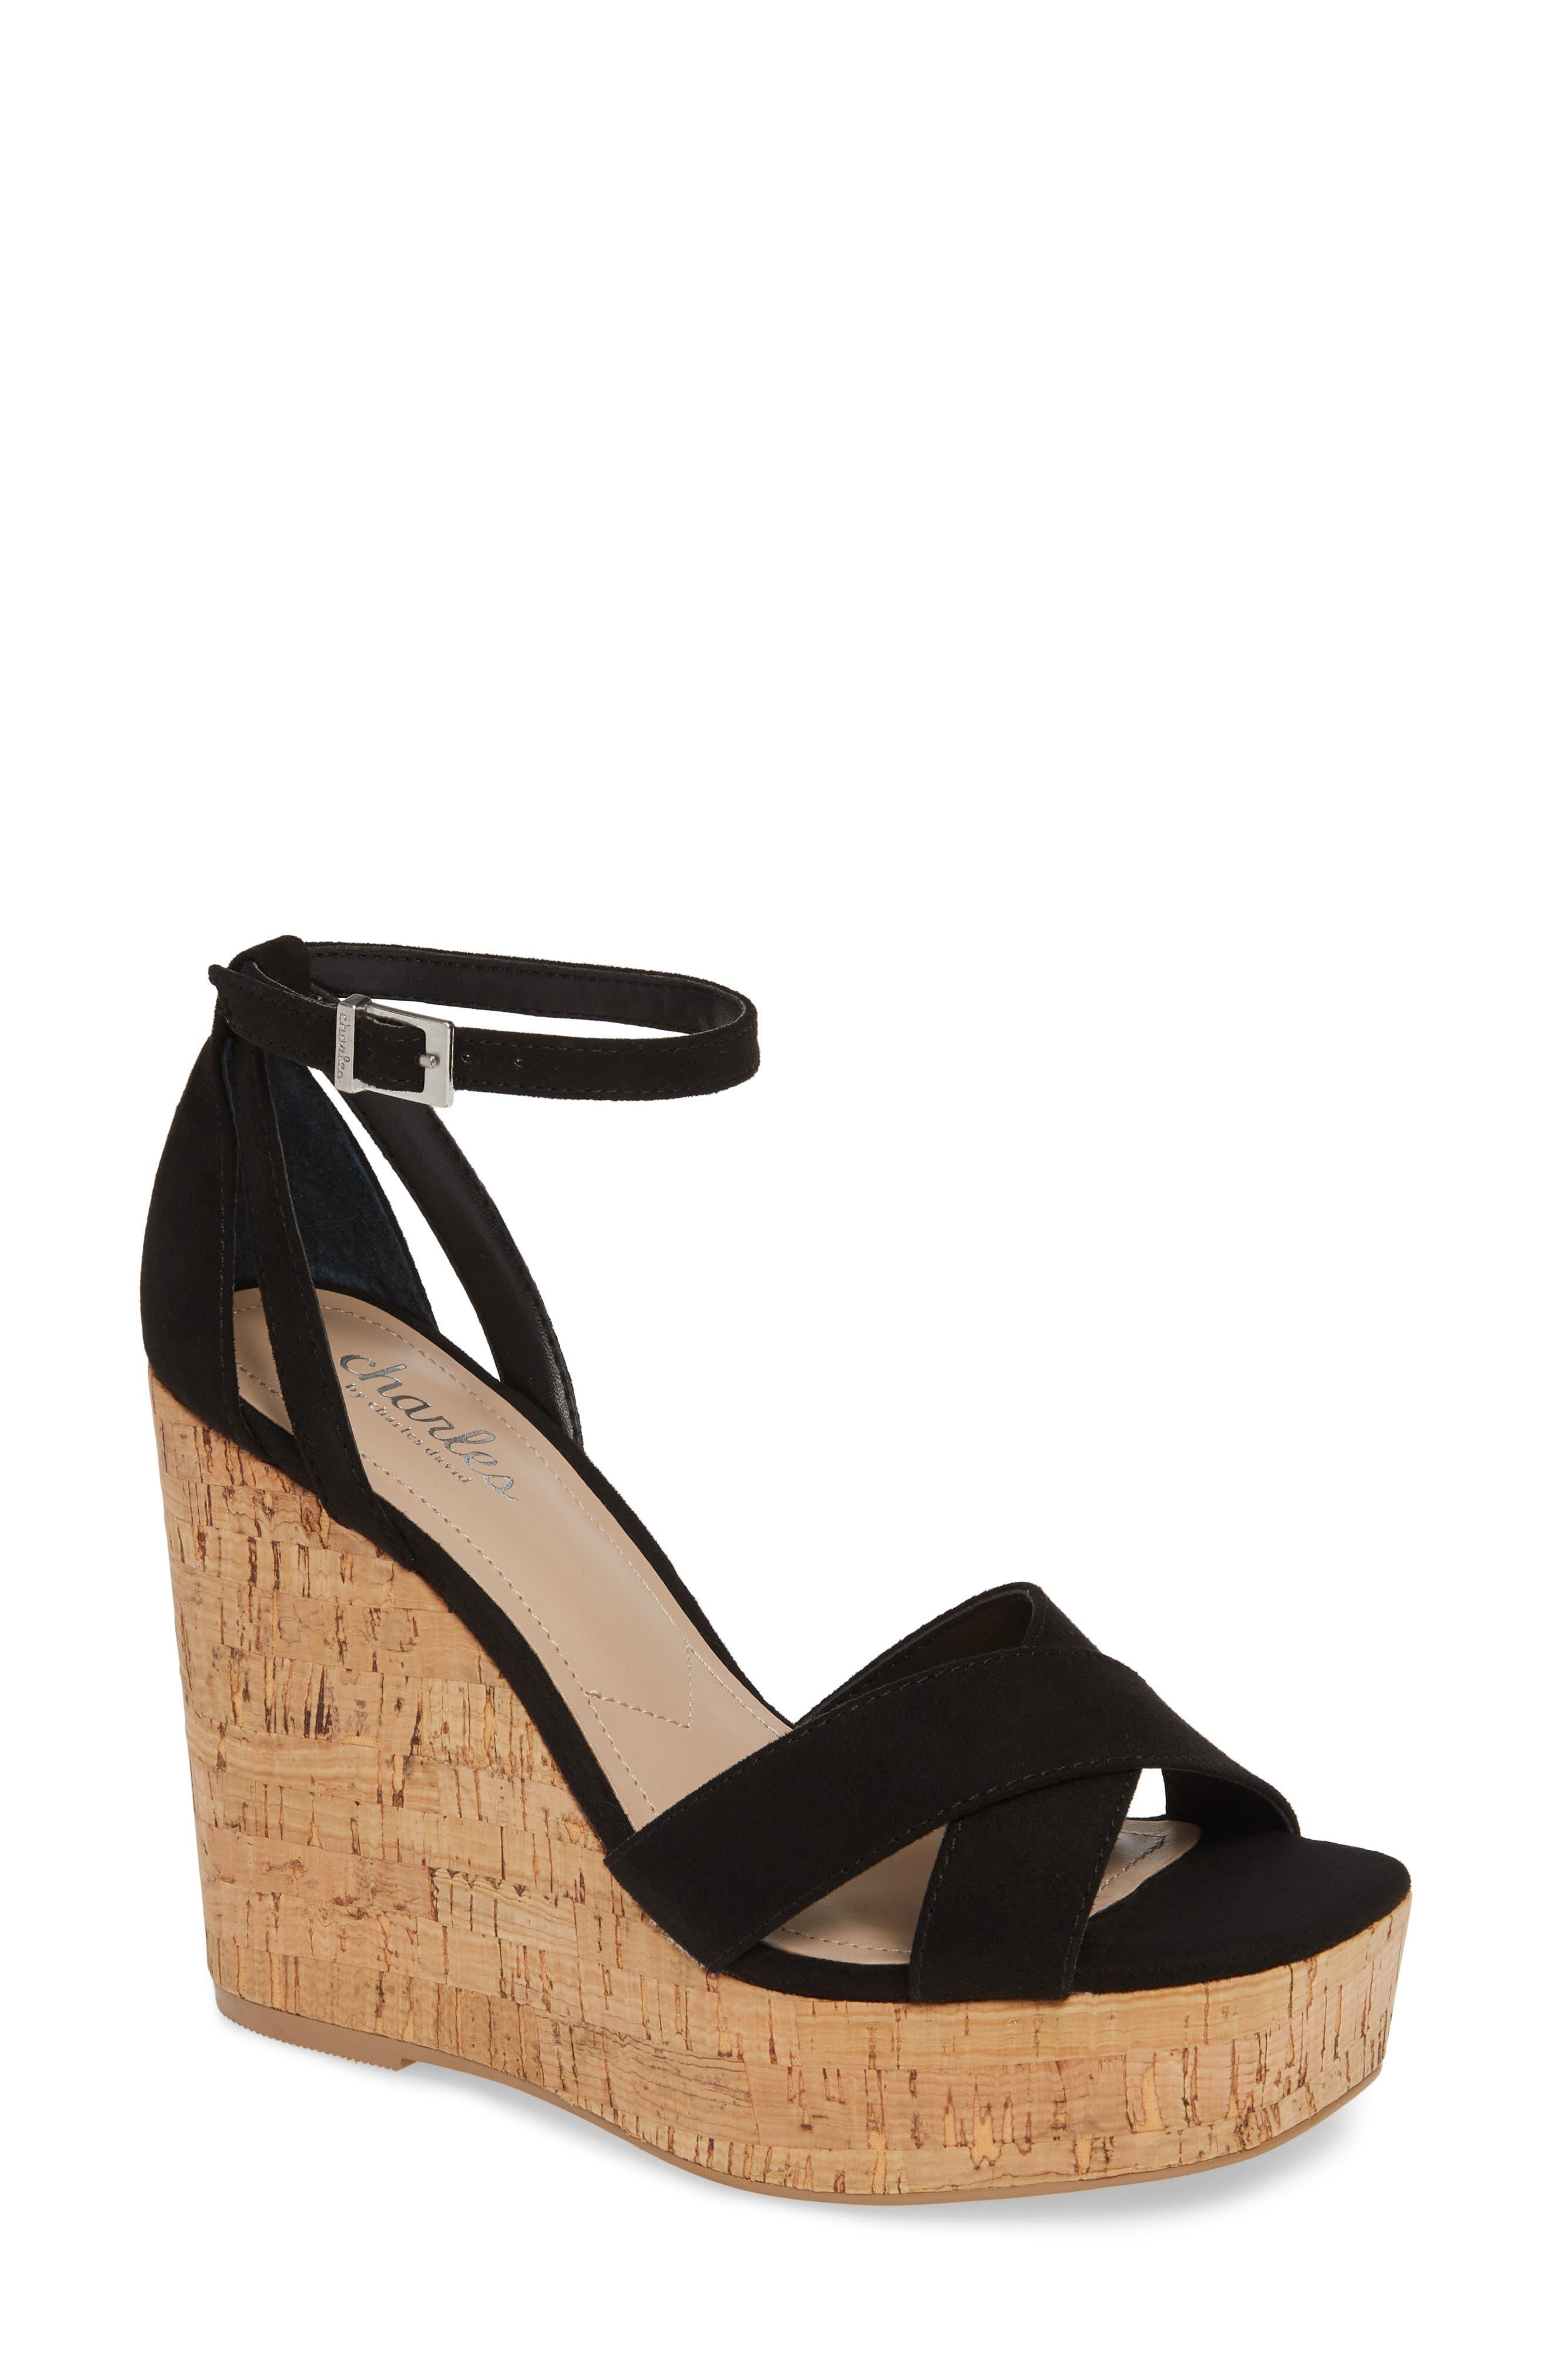 CHARLES BY CHARLES DAVID Dempsey Platform Wedge Sandal, Main, color, BLACK FABRIC